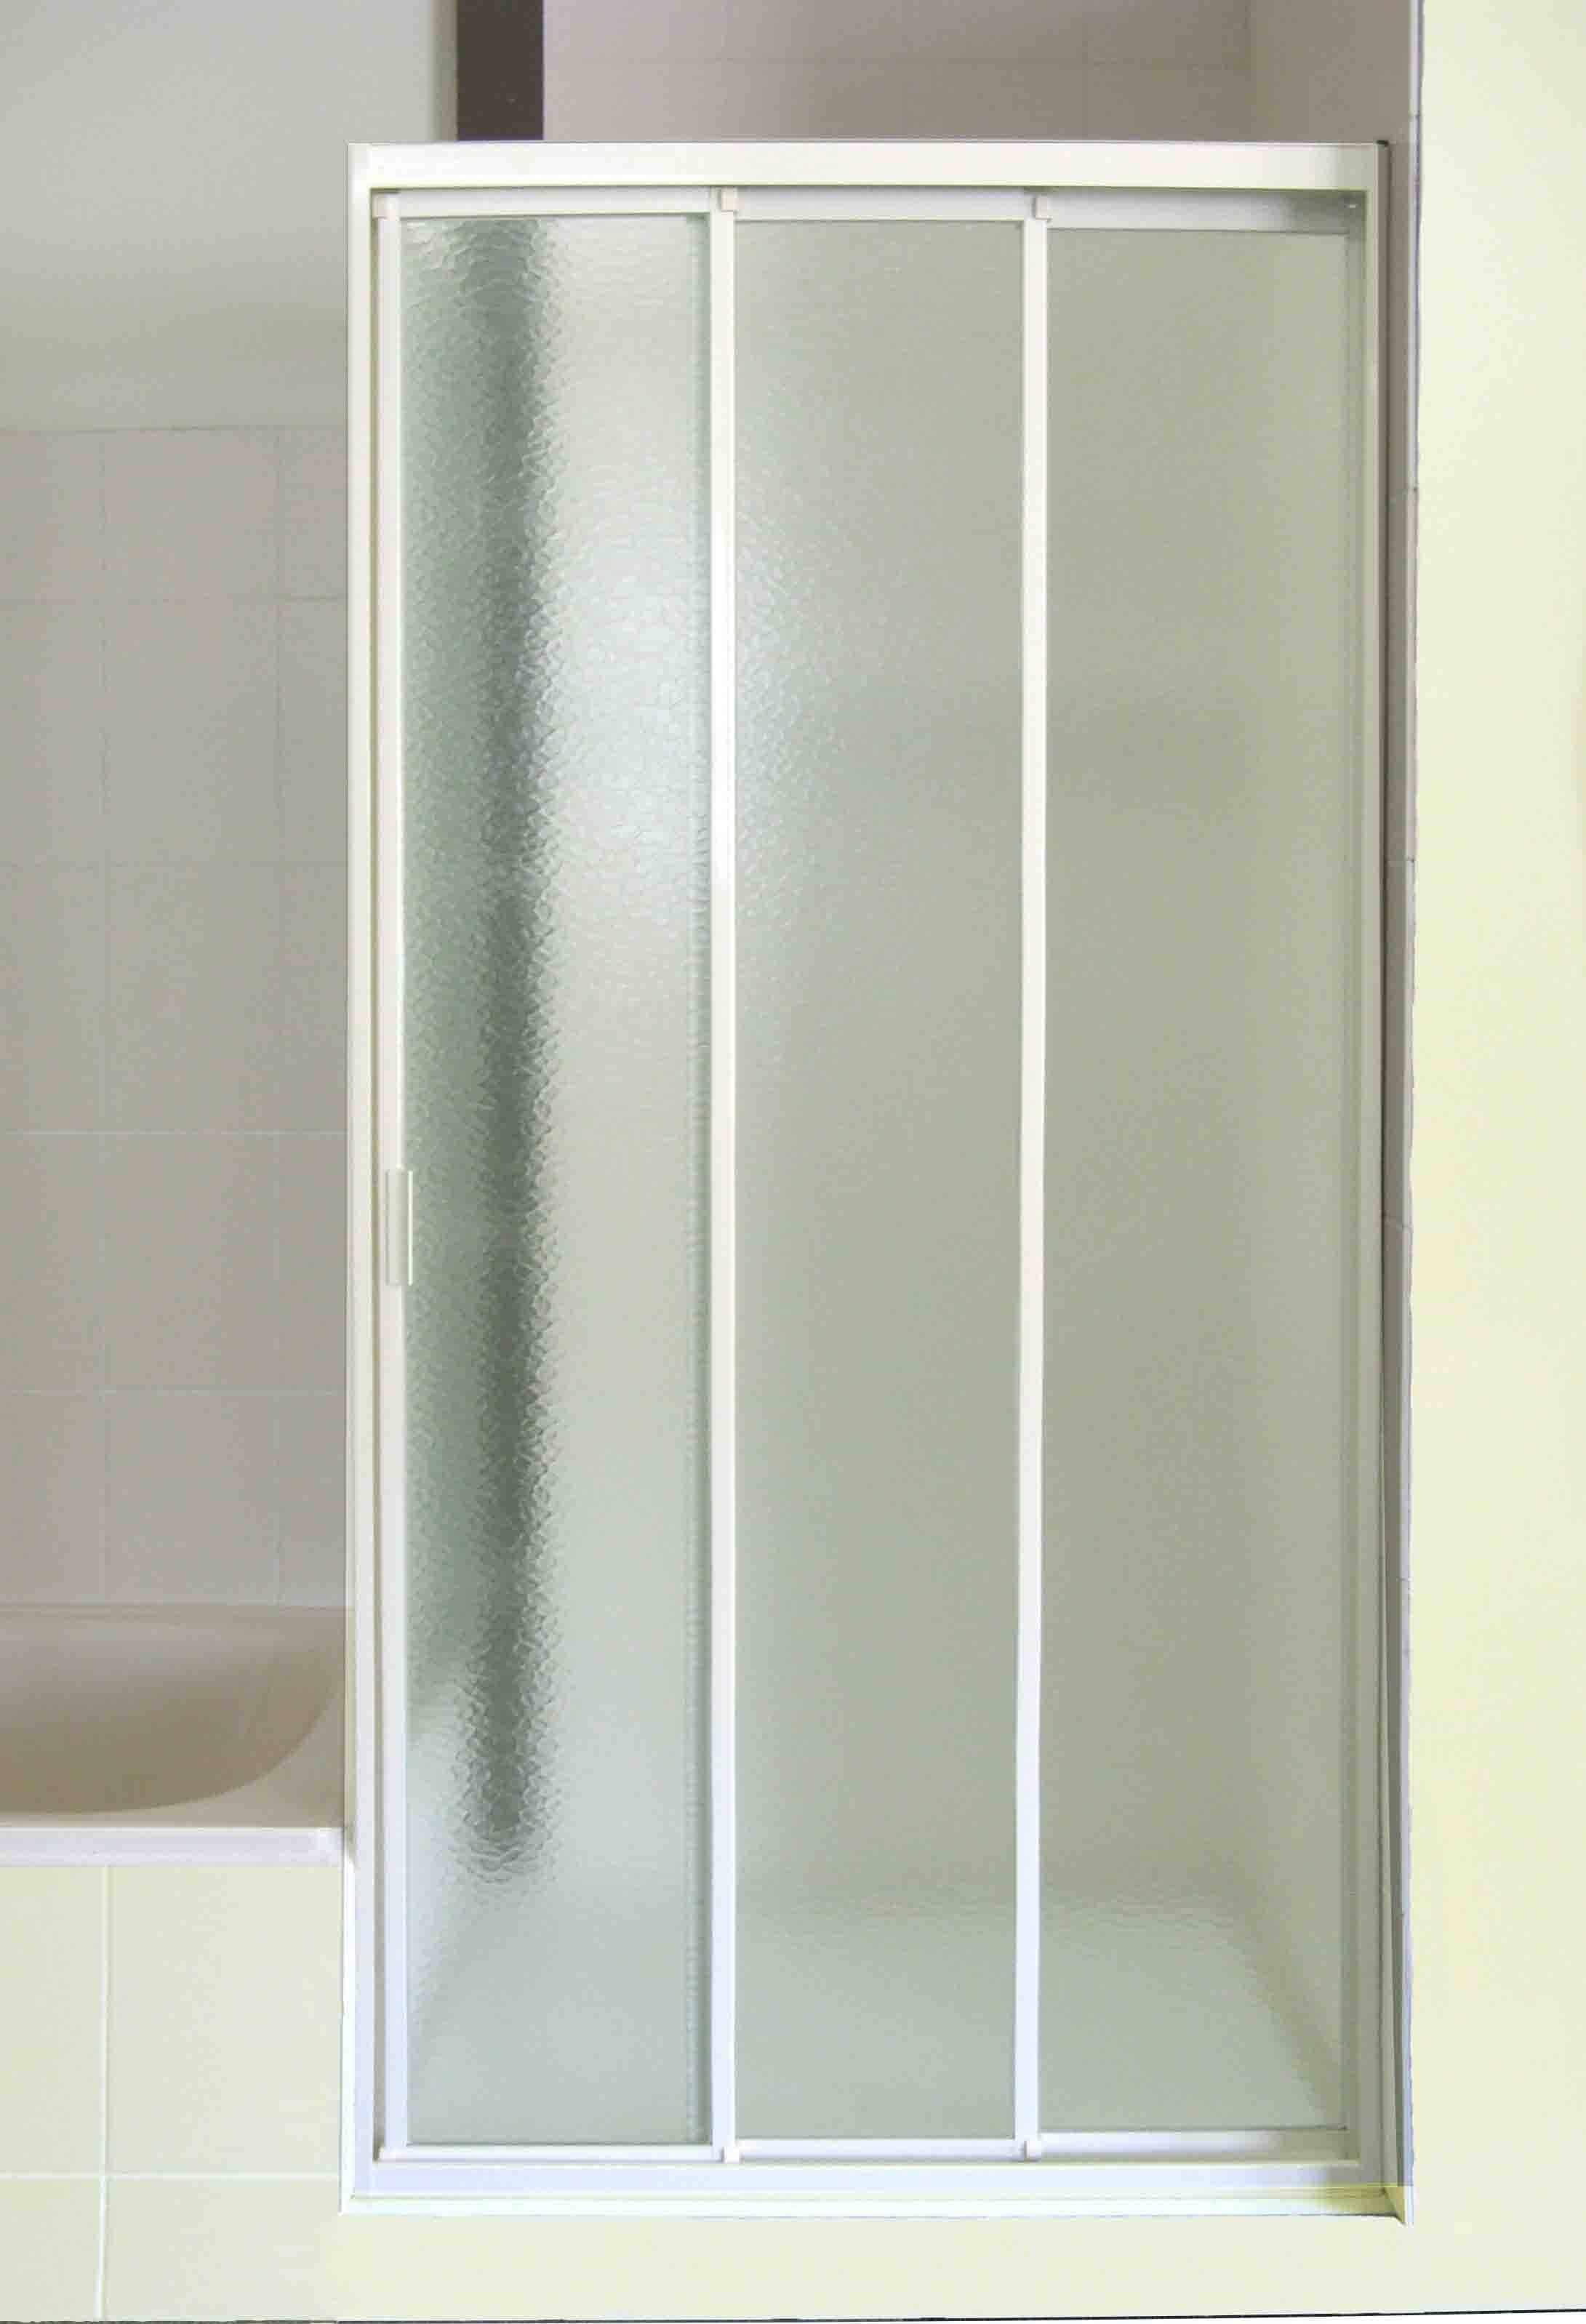 Three Panel Sliding Glass Shower DoorsThree Panel Sliding Glass Shower Doors